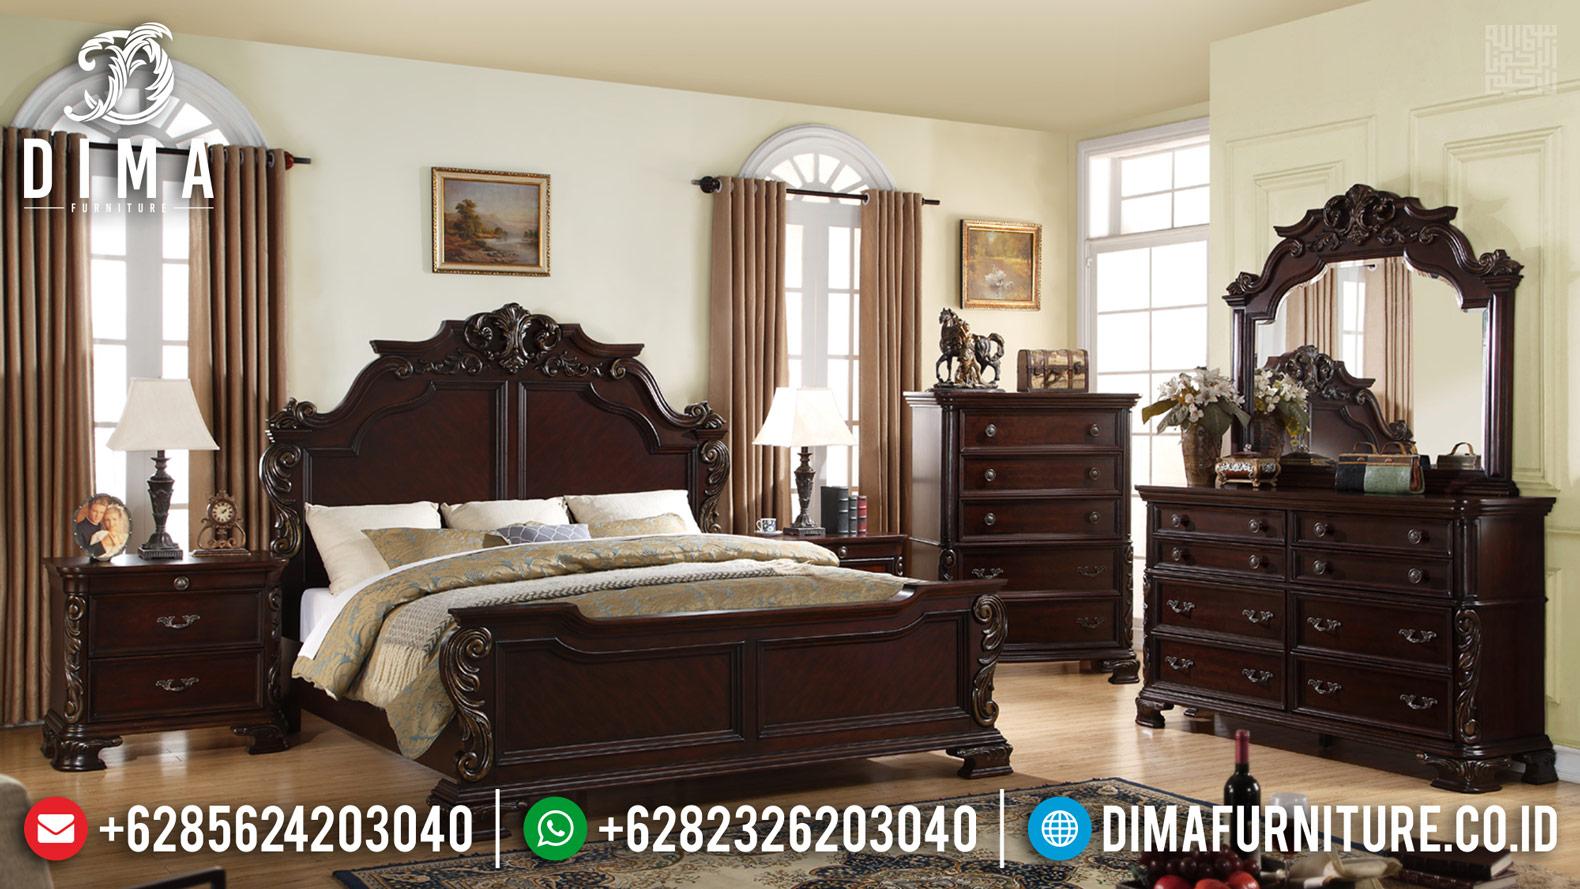 New Tempat Tidur Jepara Classic Natural Salak Brown BT-0393